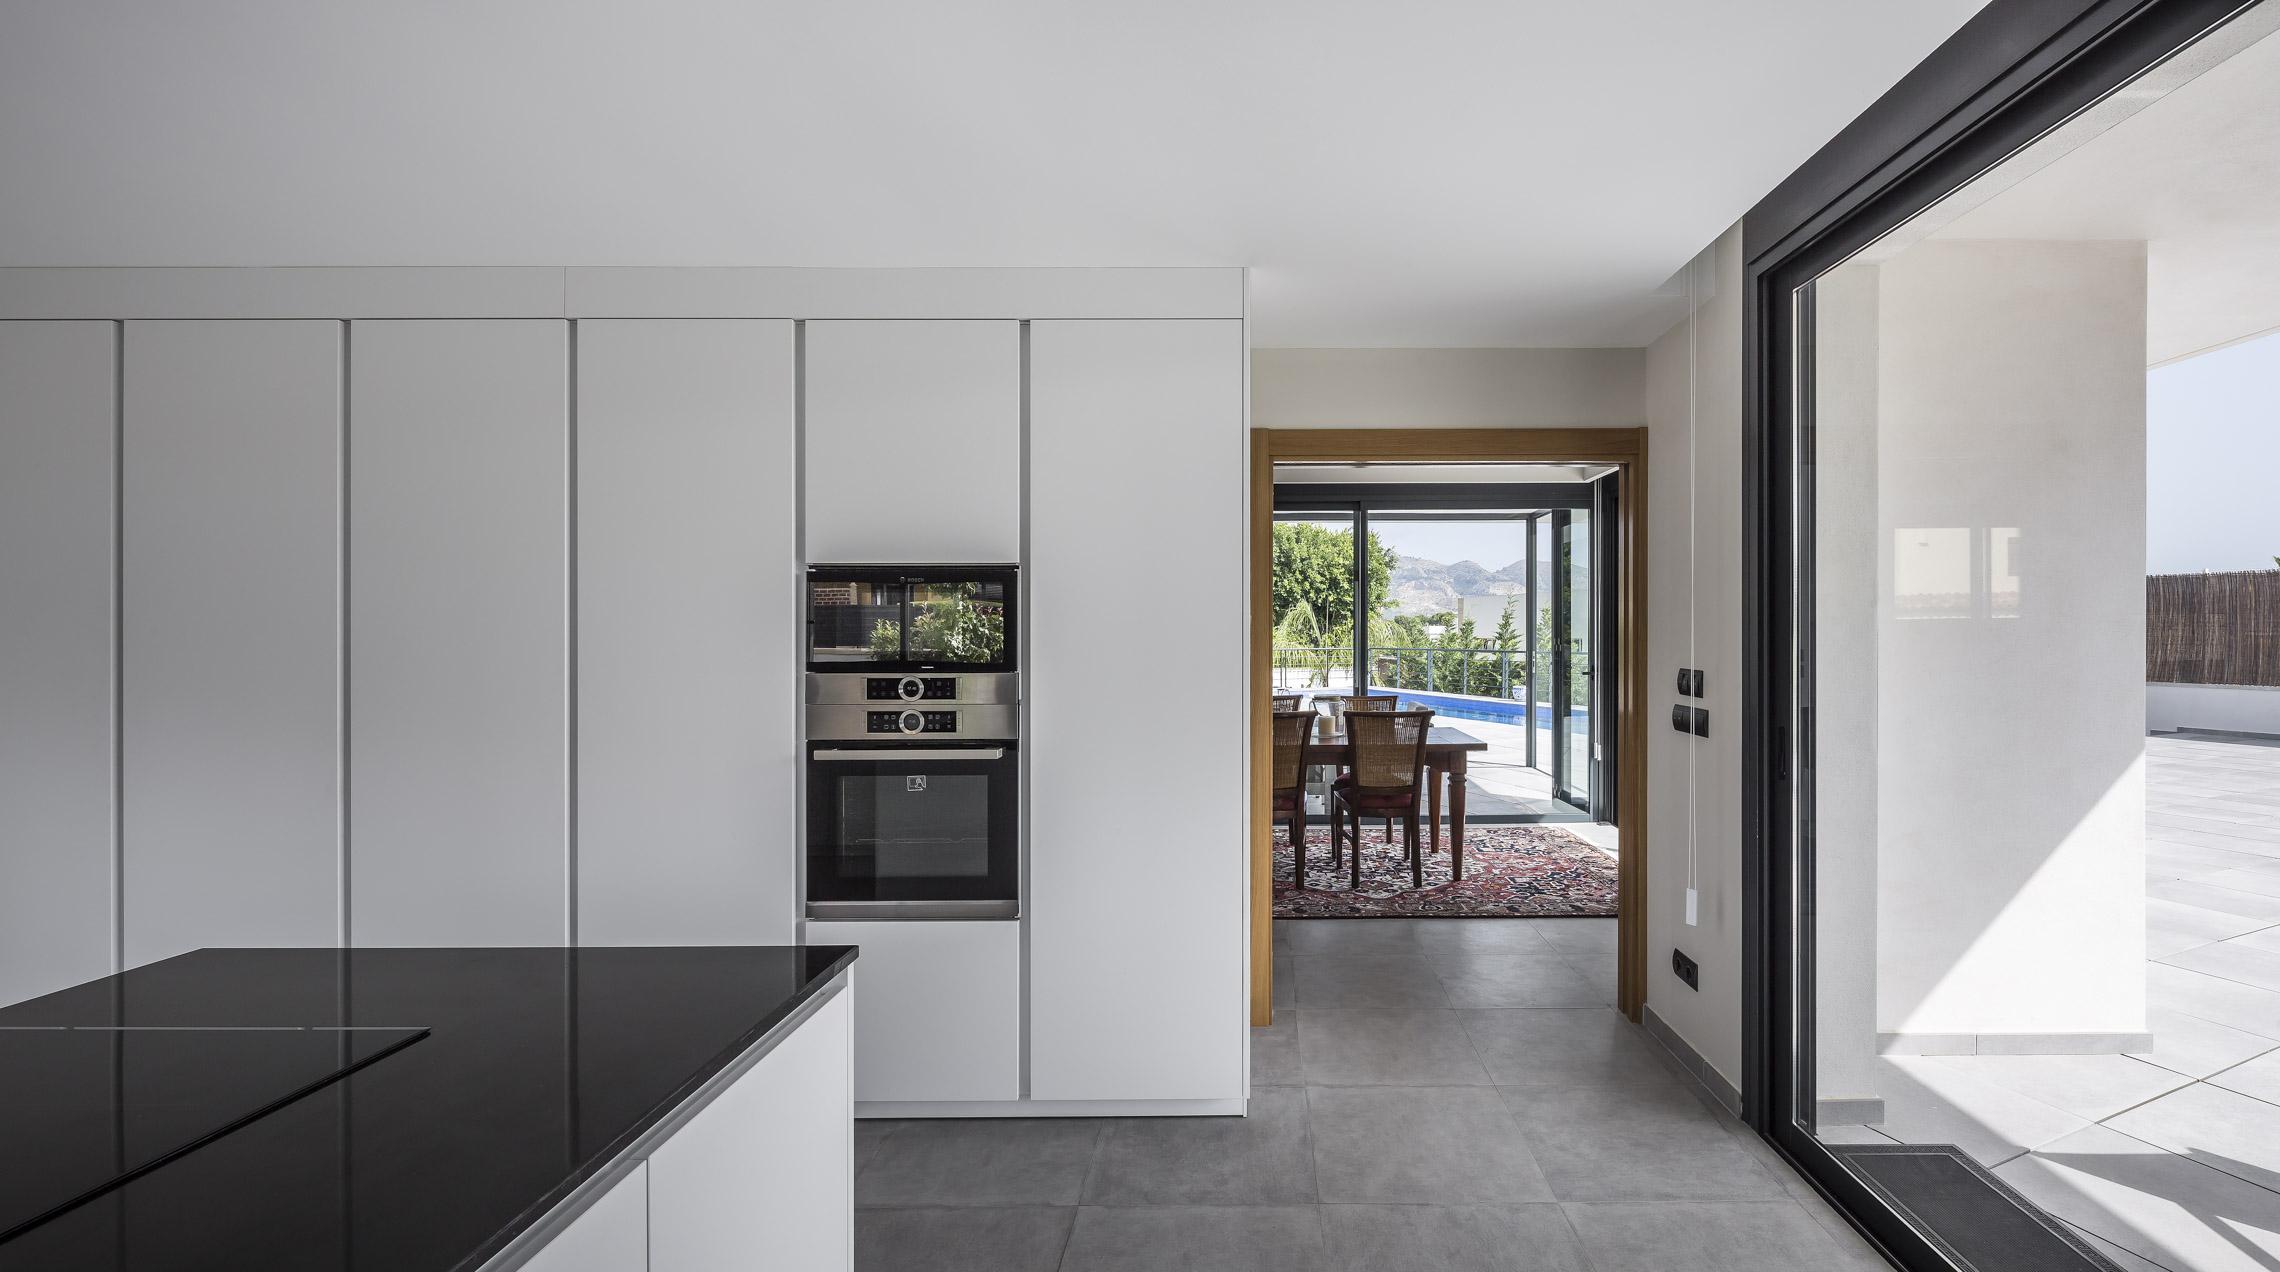 Cocina, vista 2. Casa Alicante.